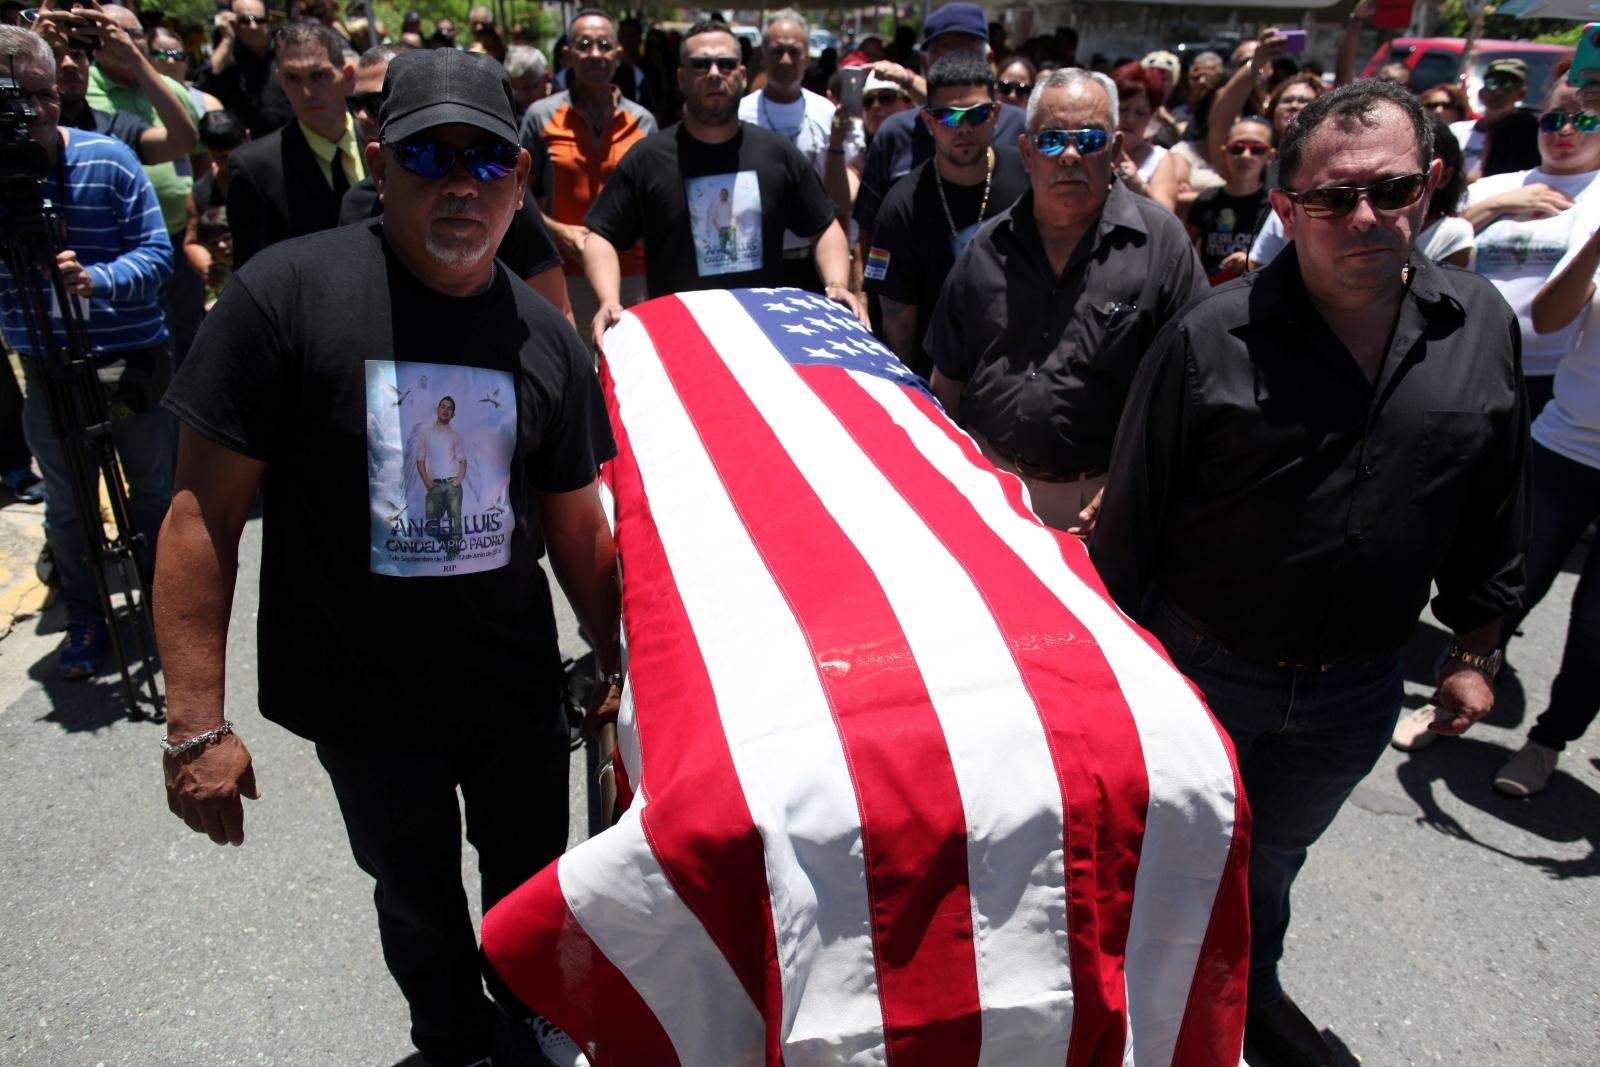 Orlando gay nightclub shooting funeral